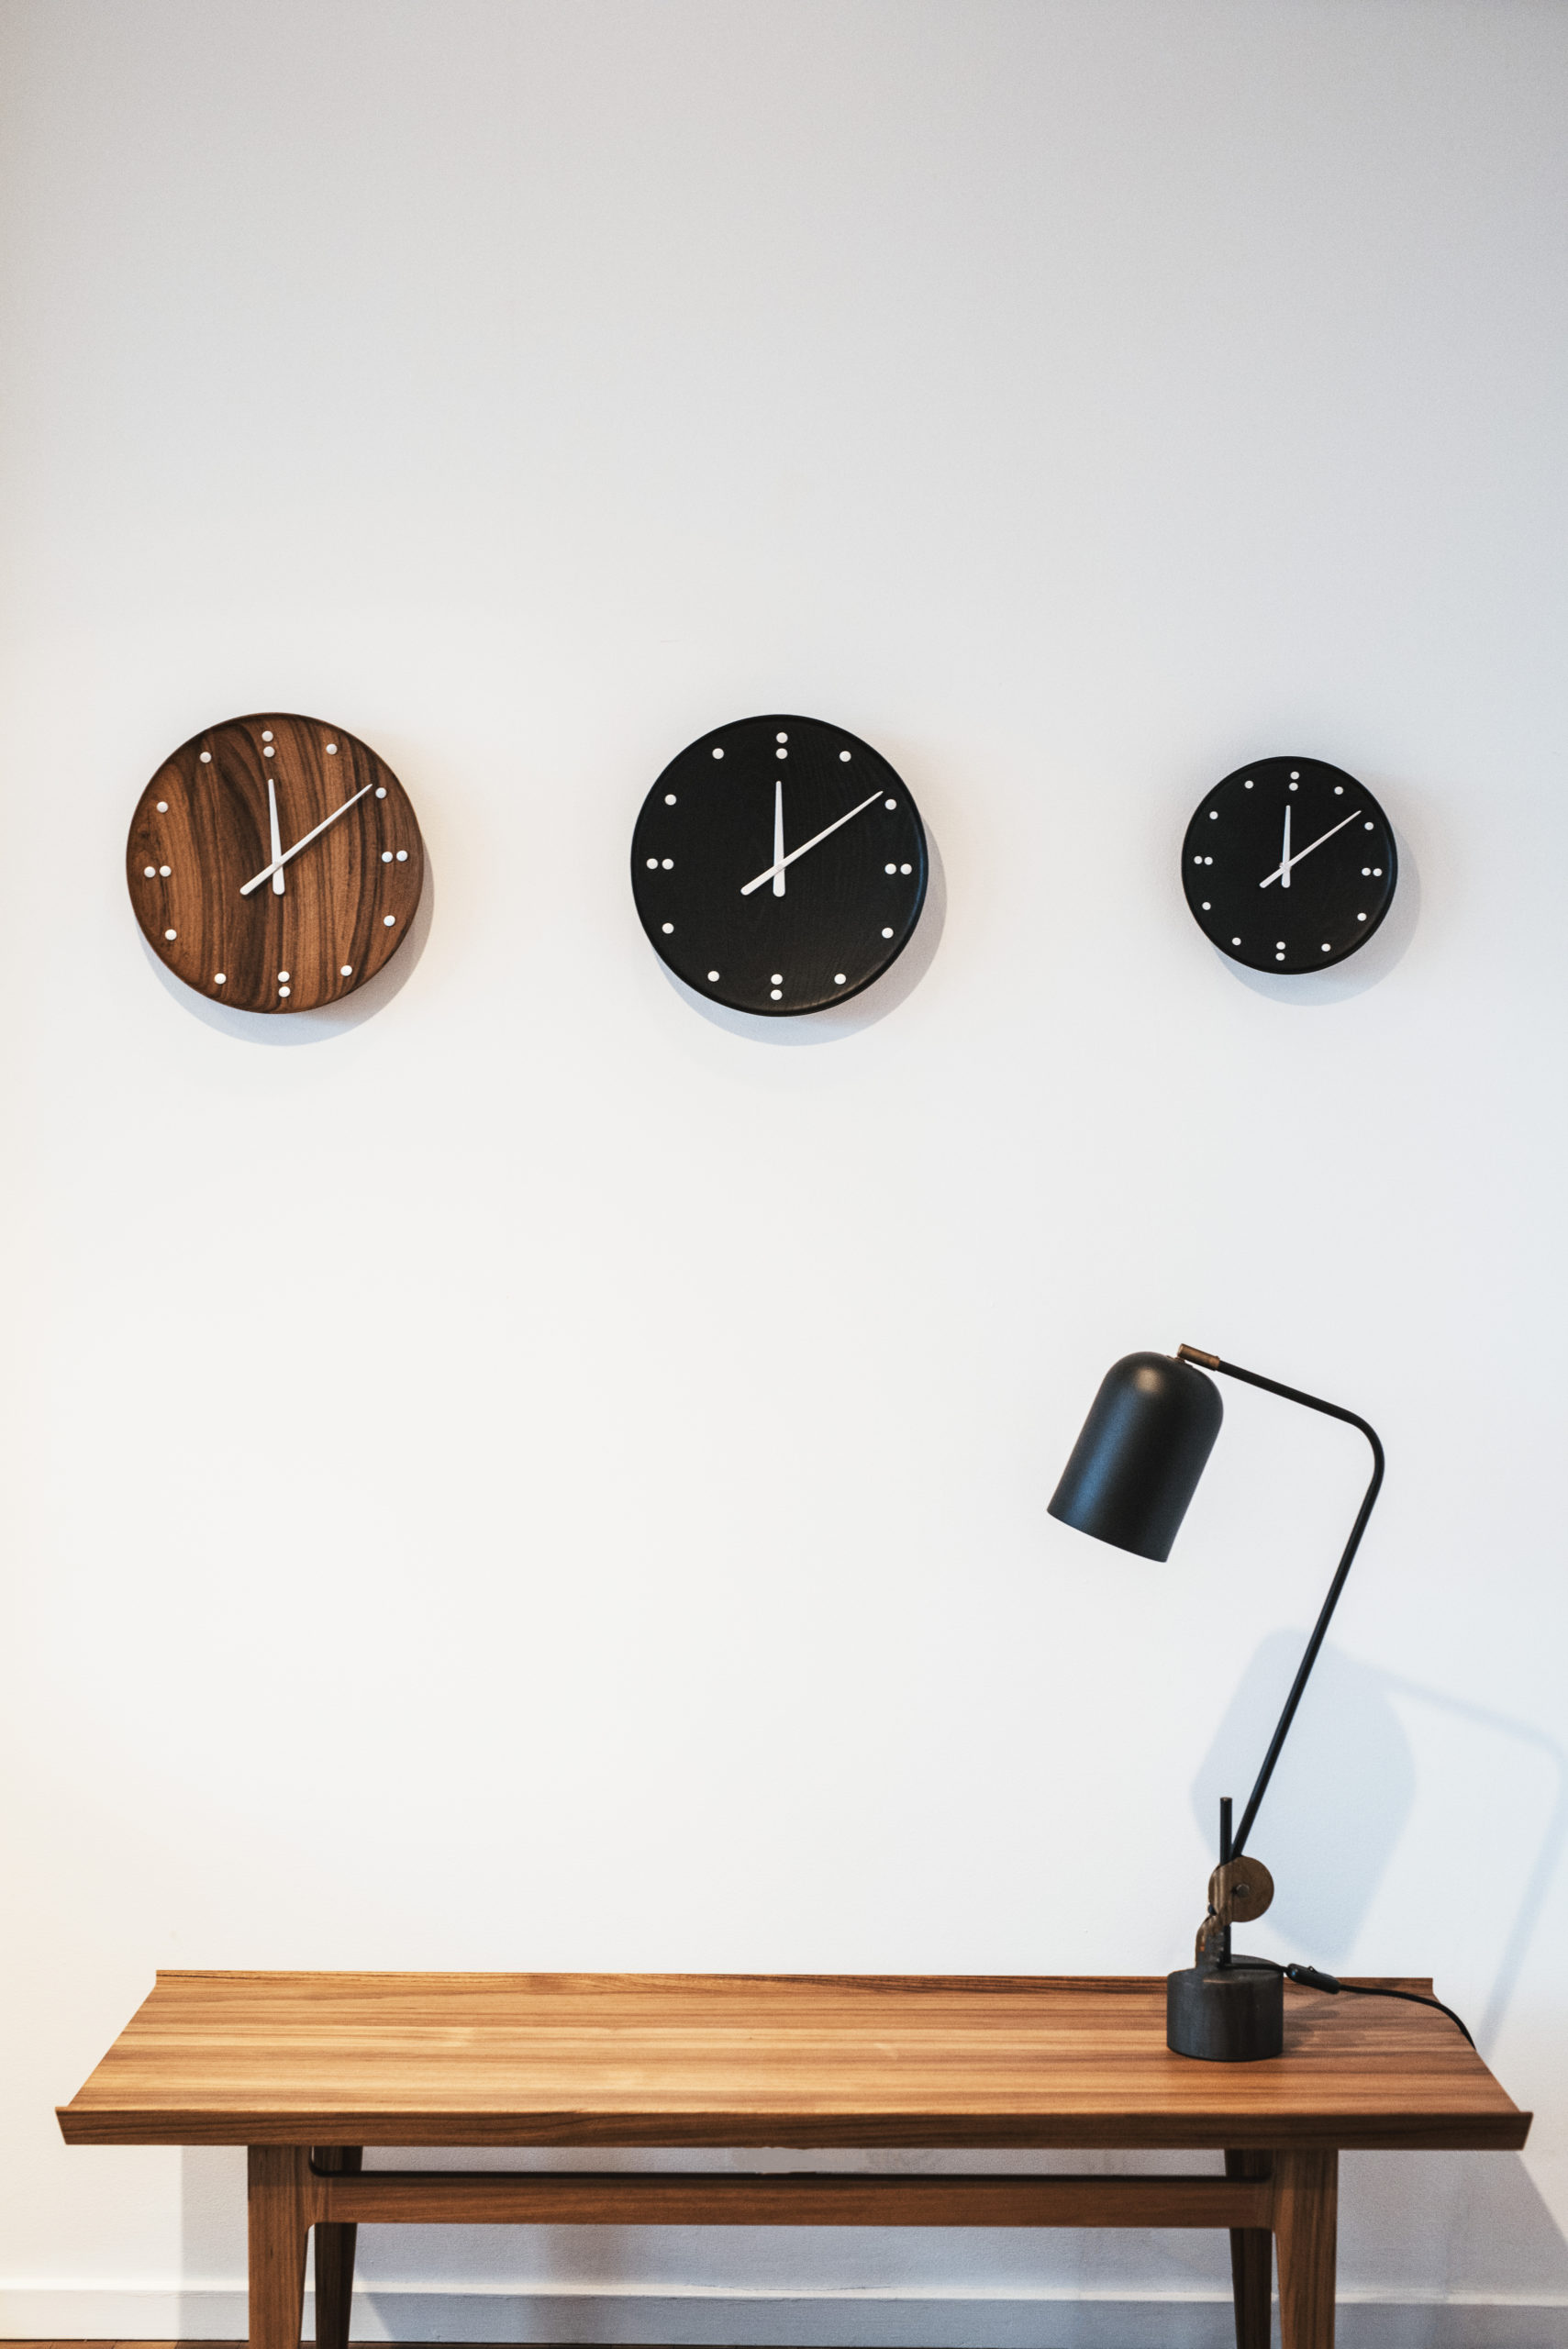 Architectmade-FJ-Clock-Wall-Clock-Teak-and-Ash-Wood-Denmark-Finn-Juhl-7